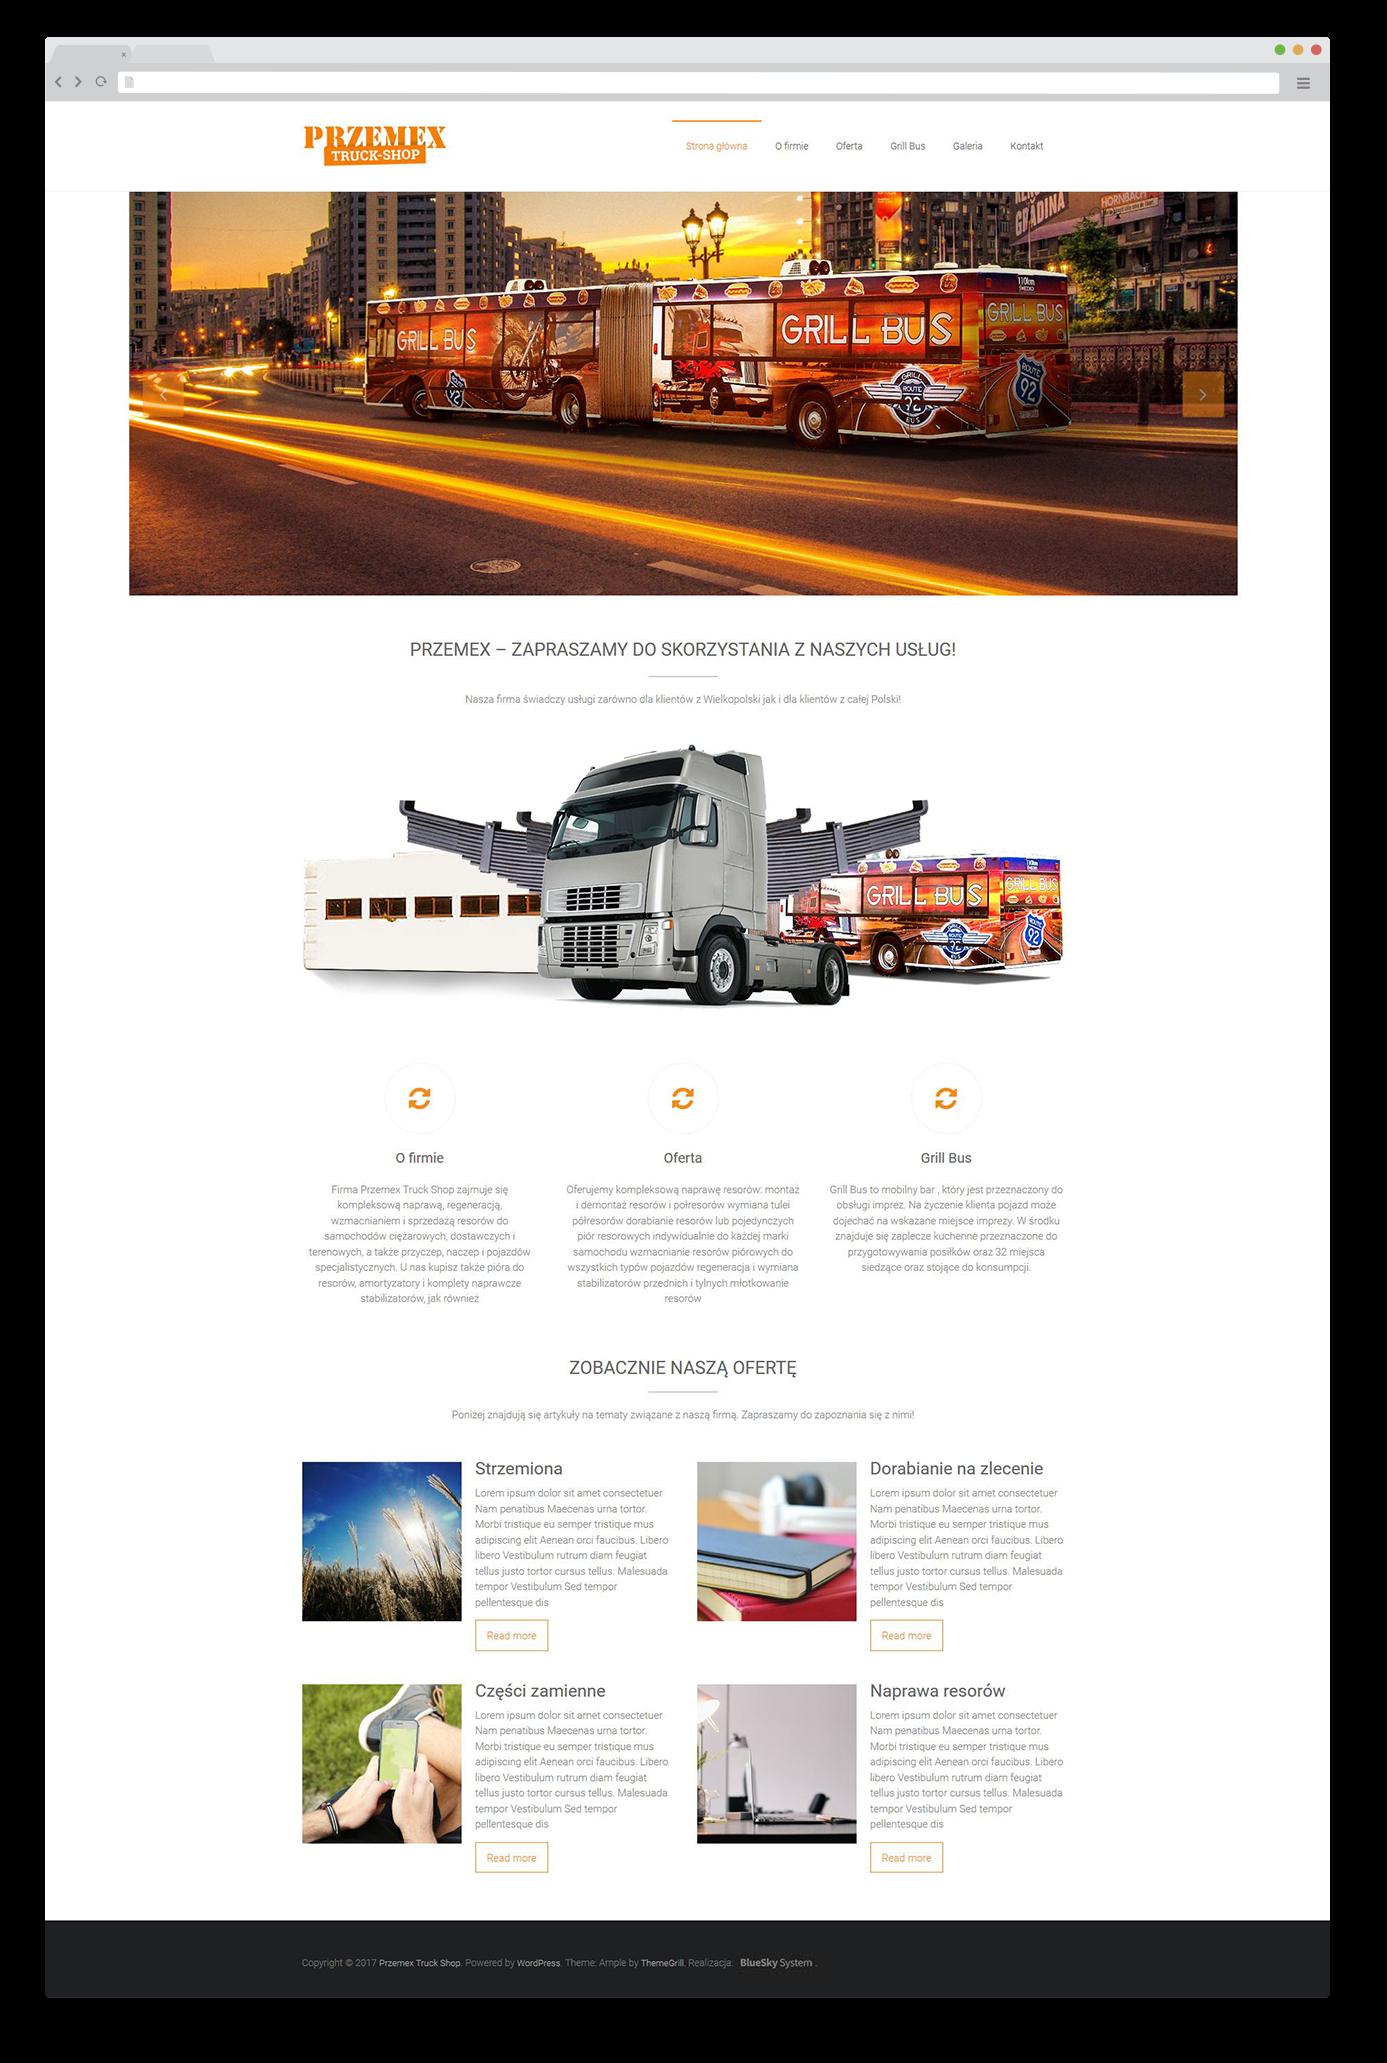 Portfolio_BlueSky_System_Przemex_Truck_Shop-FULL